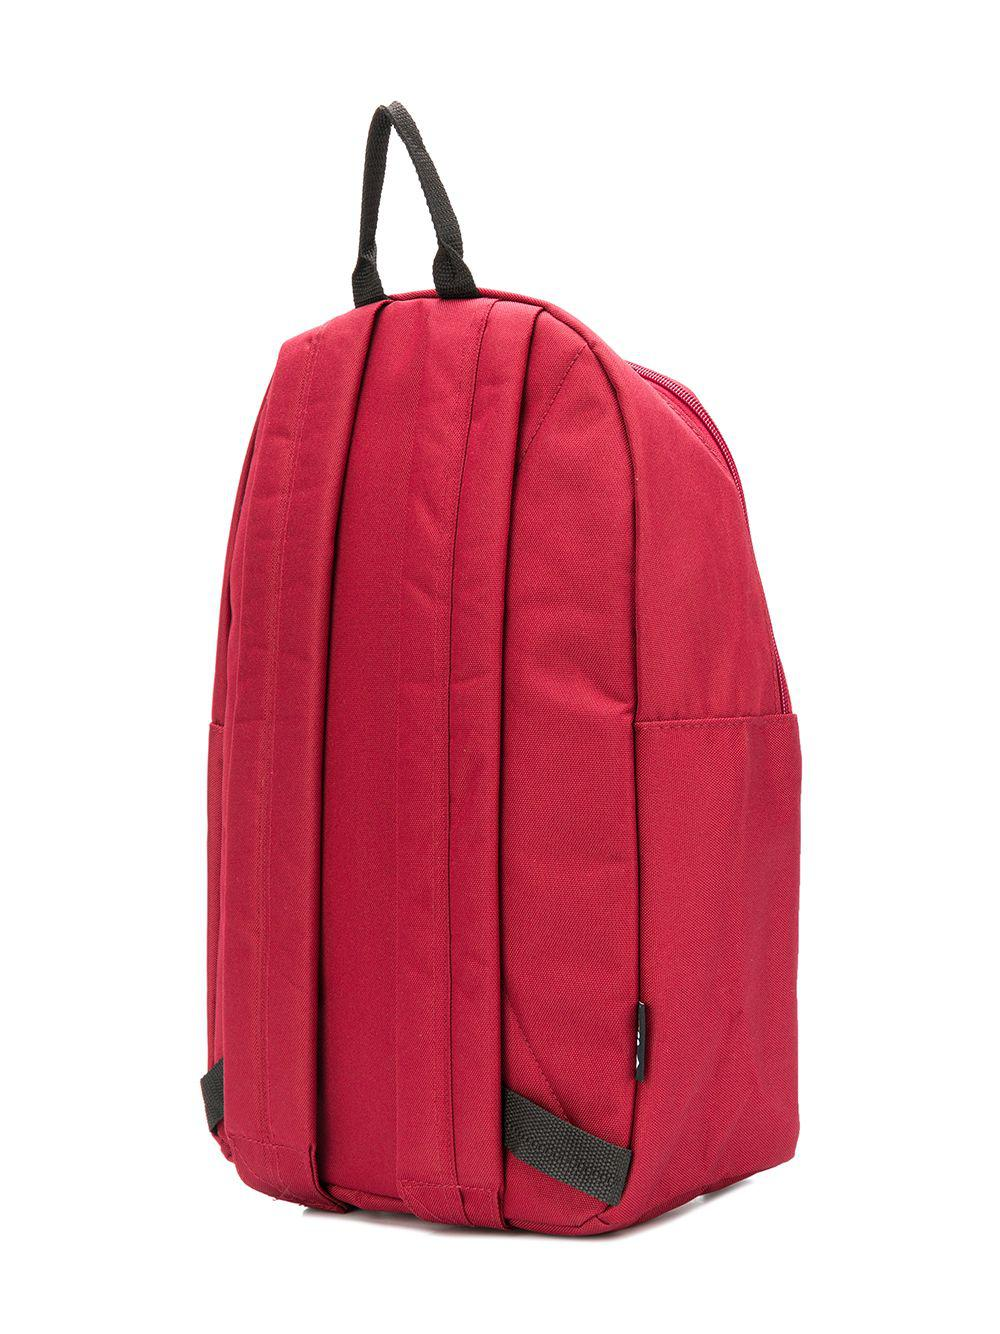 2b9dbea71a Lyst - Fila Contrast Logo Backpack in Red for Men